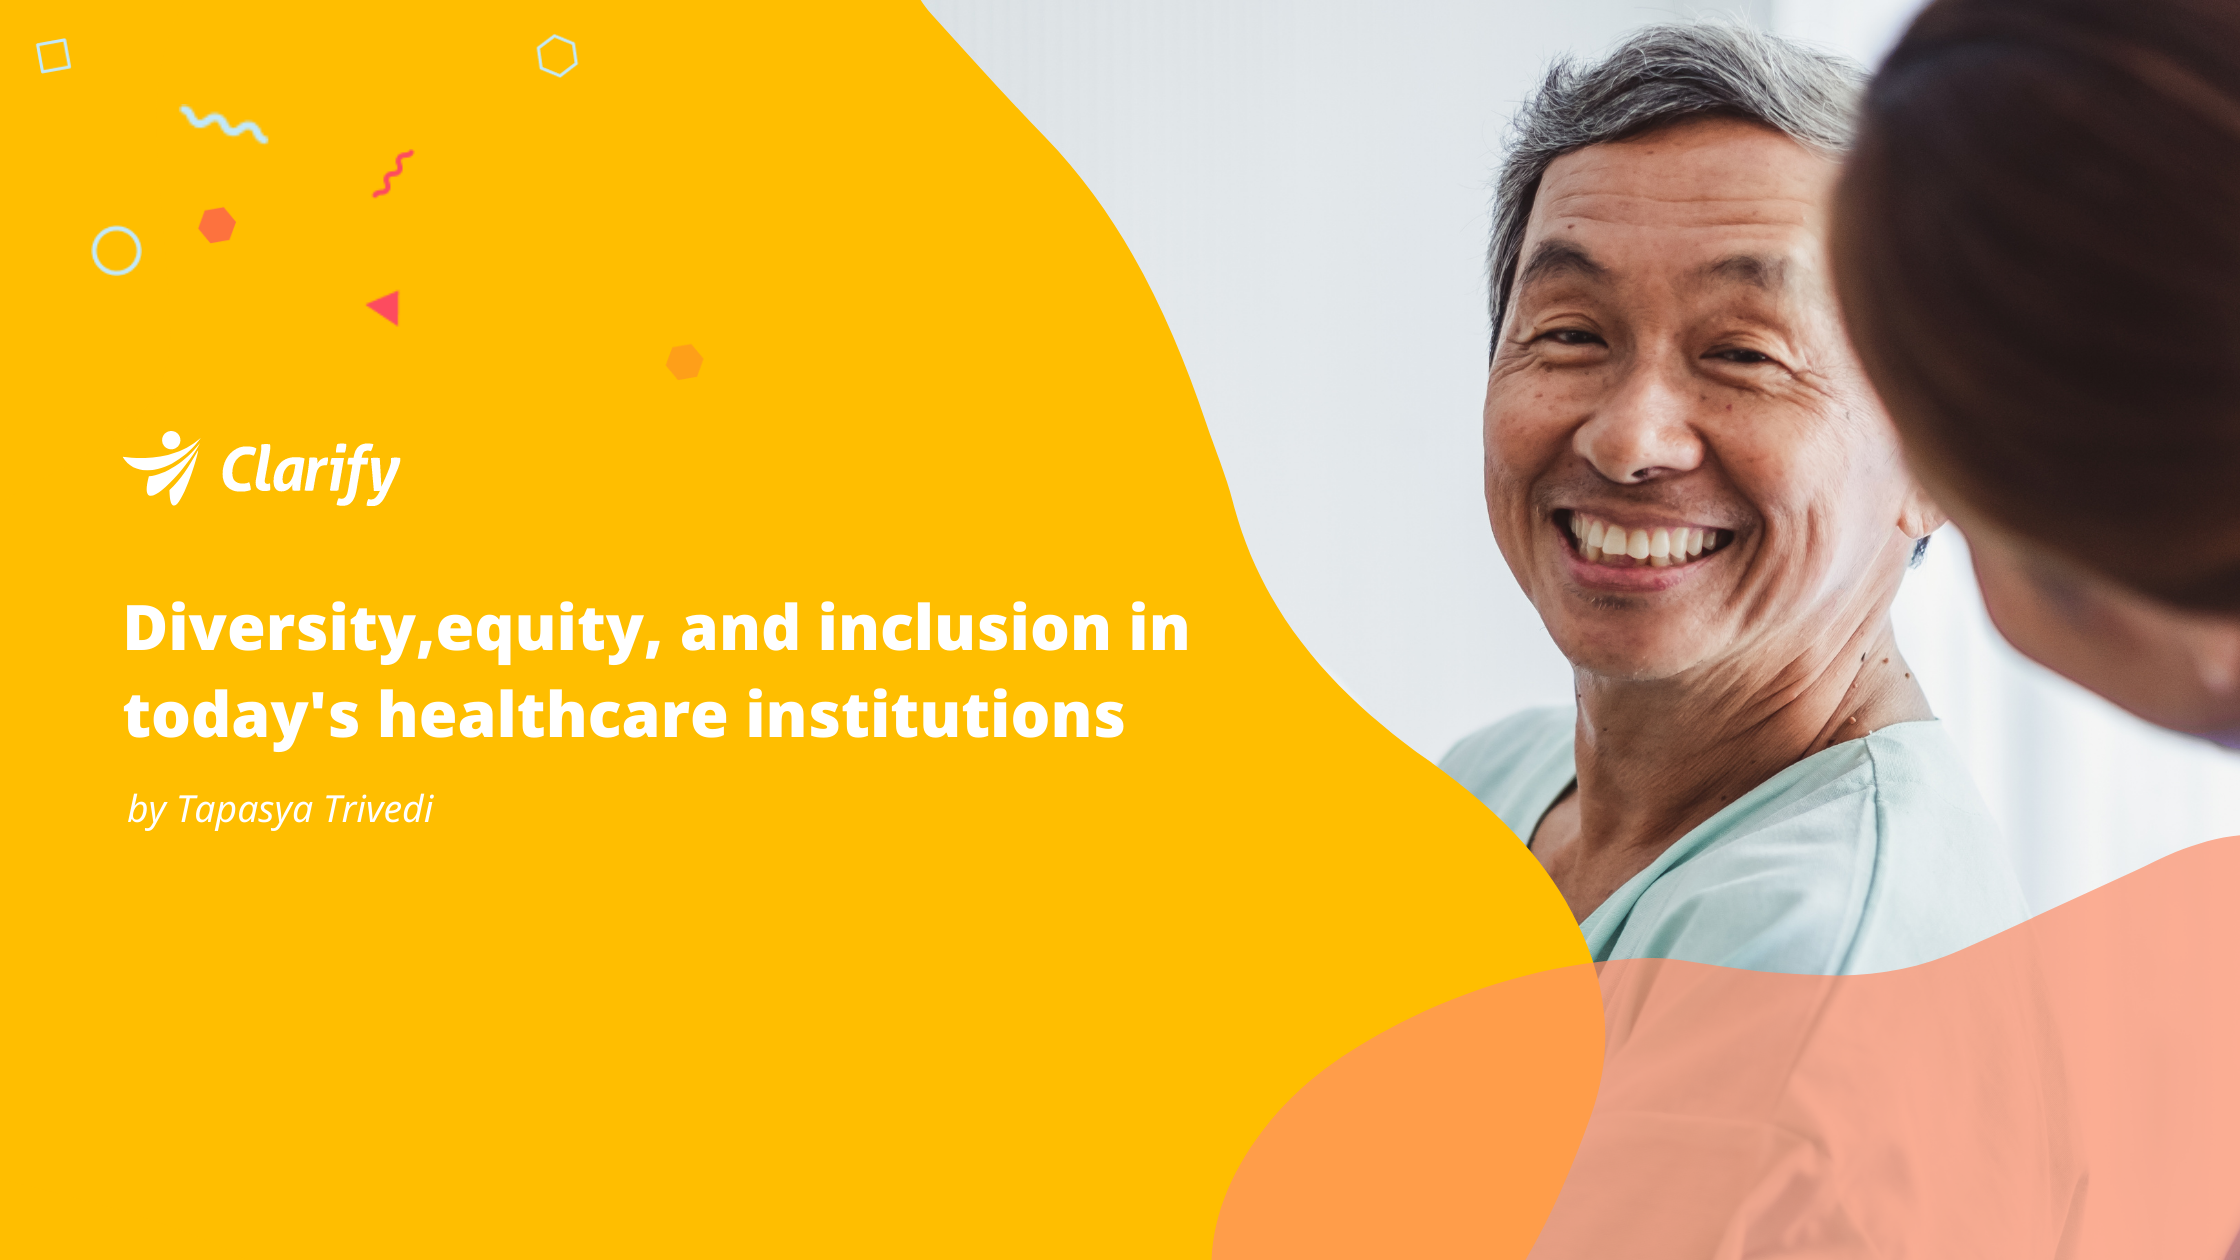 Clarify Health Blog: Diversity, Equity, Inclusion